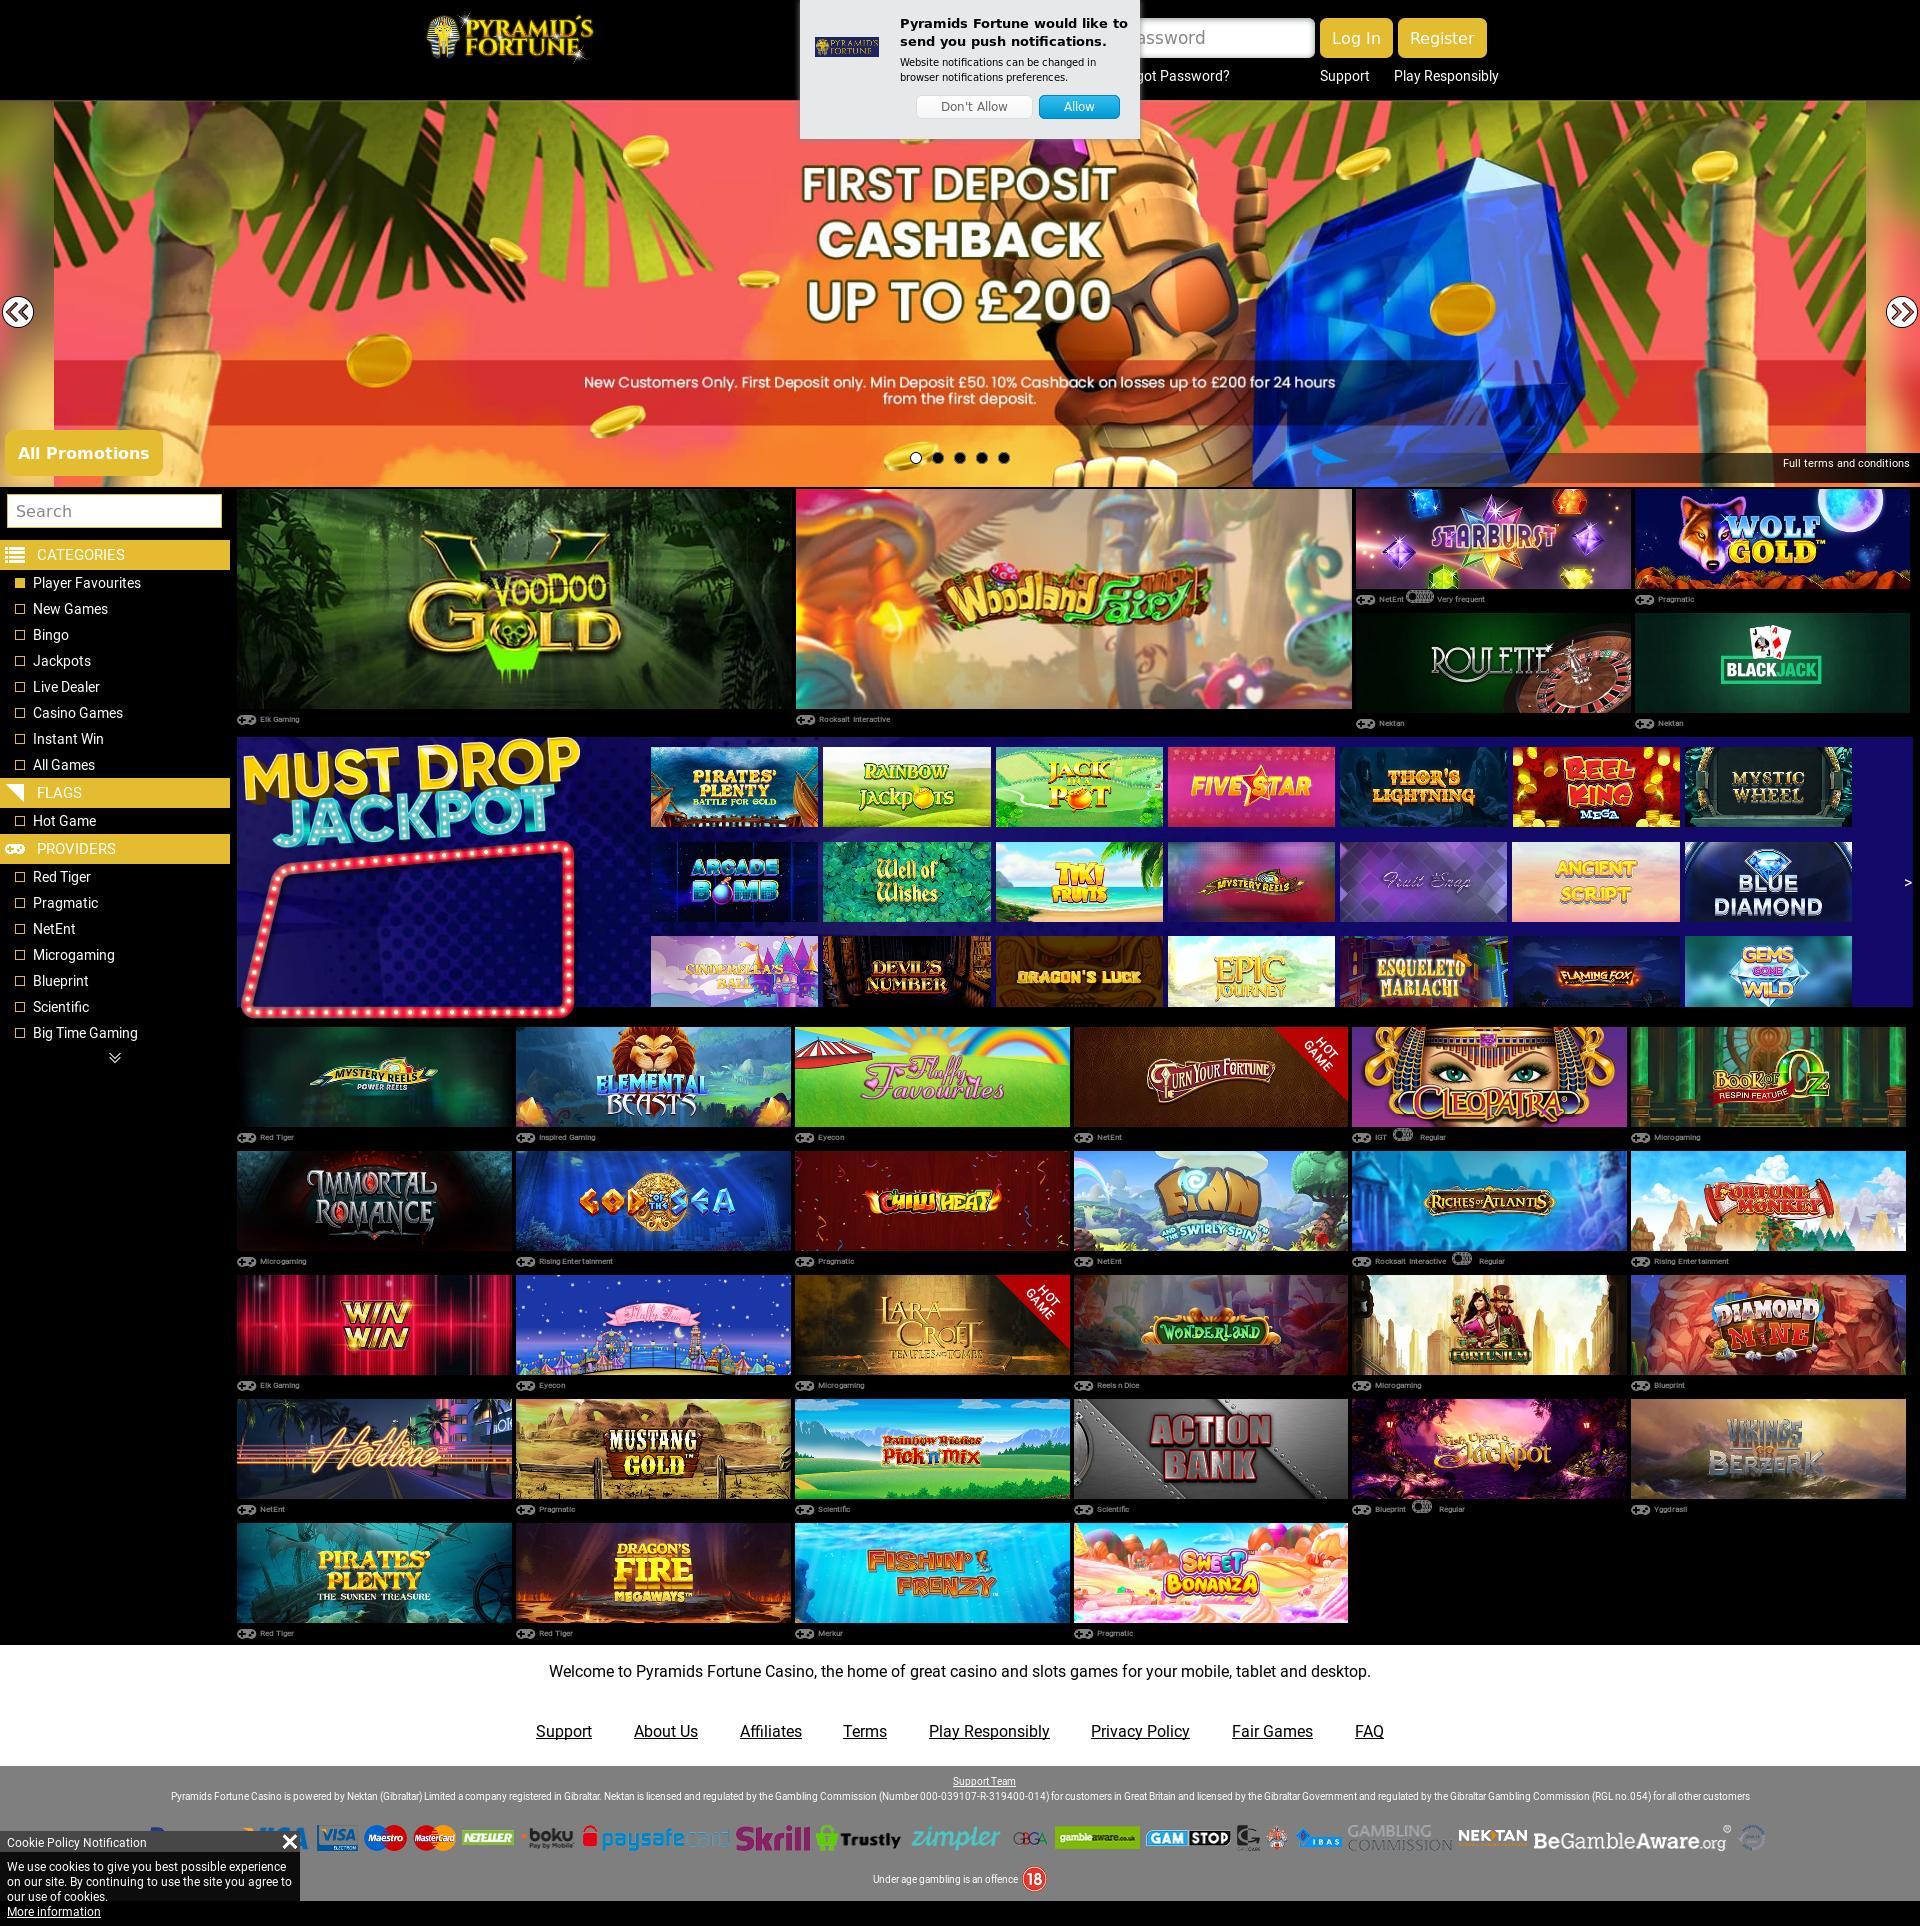 Casino screen Lobby 2019-10-17 for United Kingdom